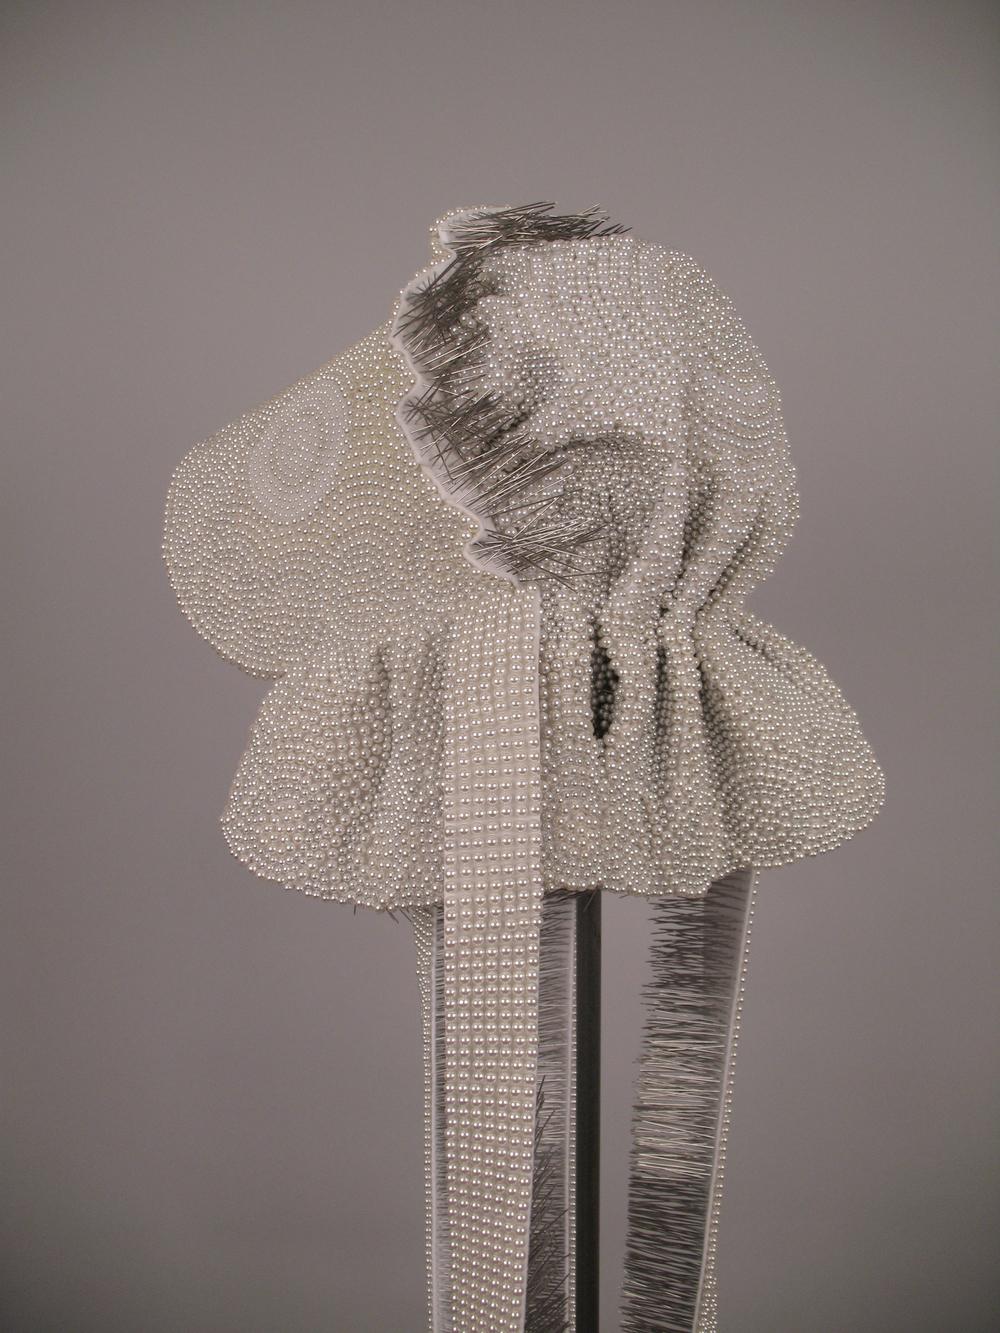 "Seer Bonnet XV  19, 712 pearl corsage pins, fabric, steel, 69"" x 12"" x 16"", 2010-2011"